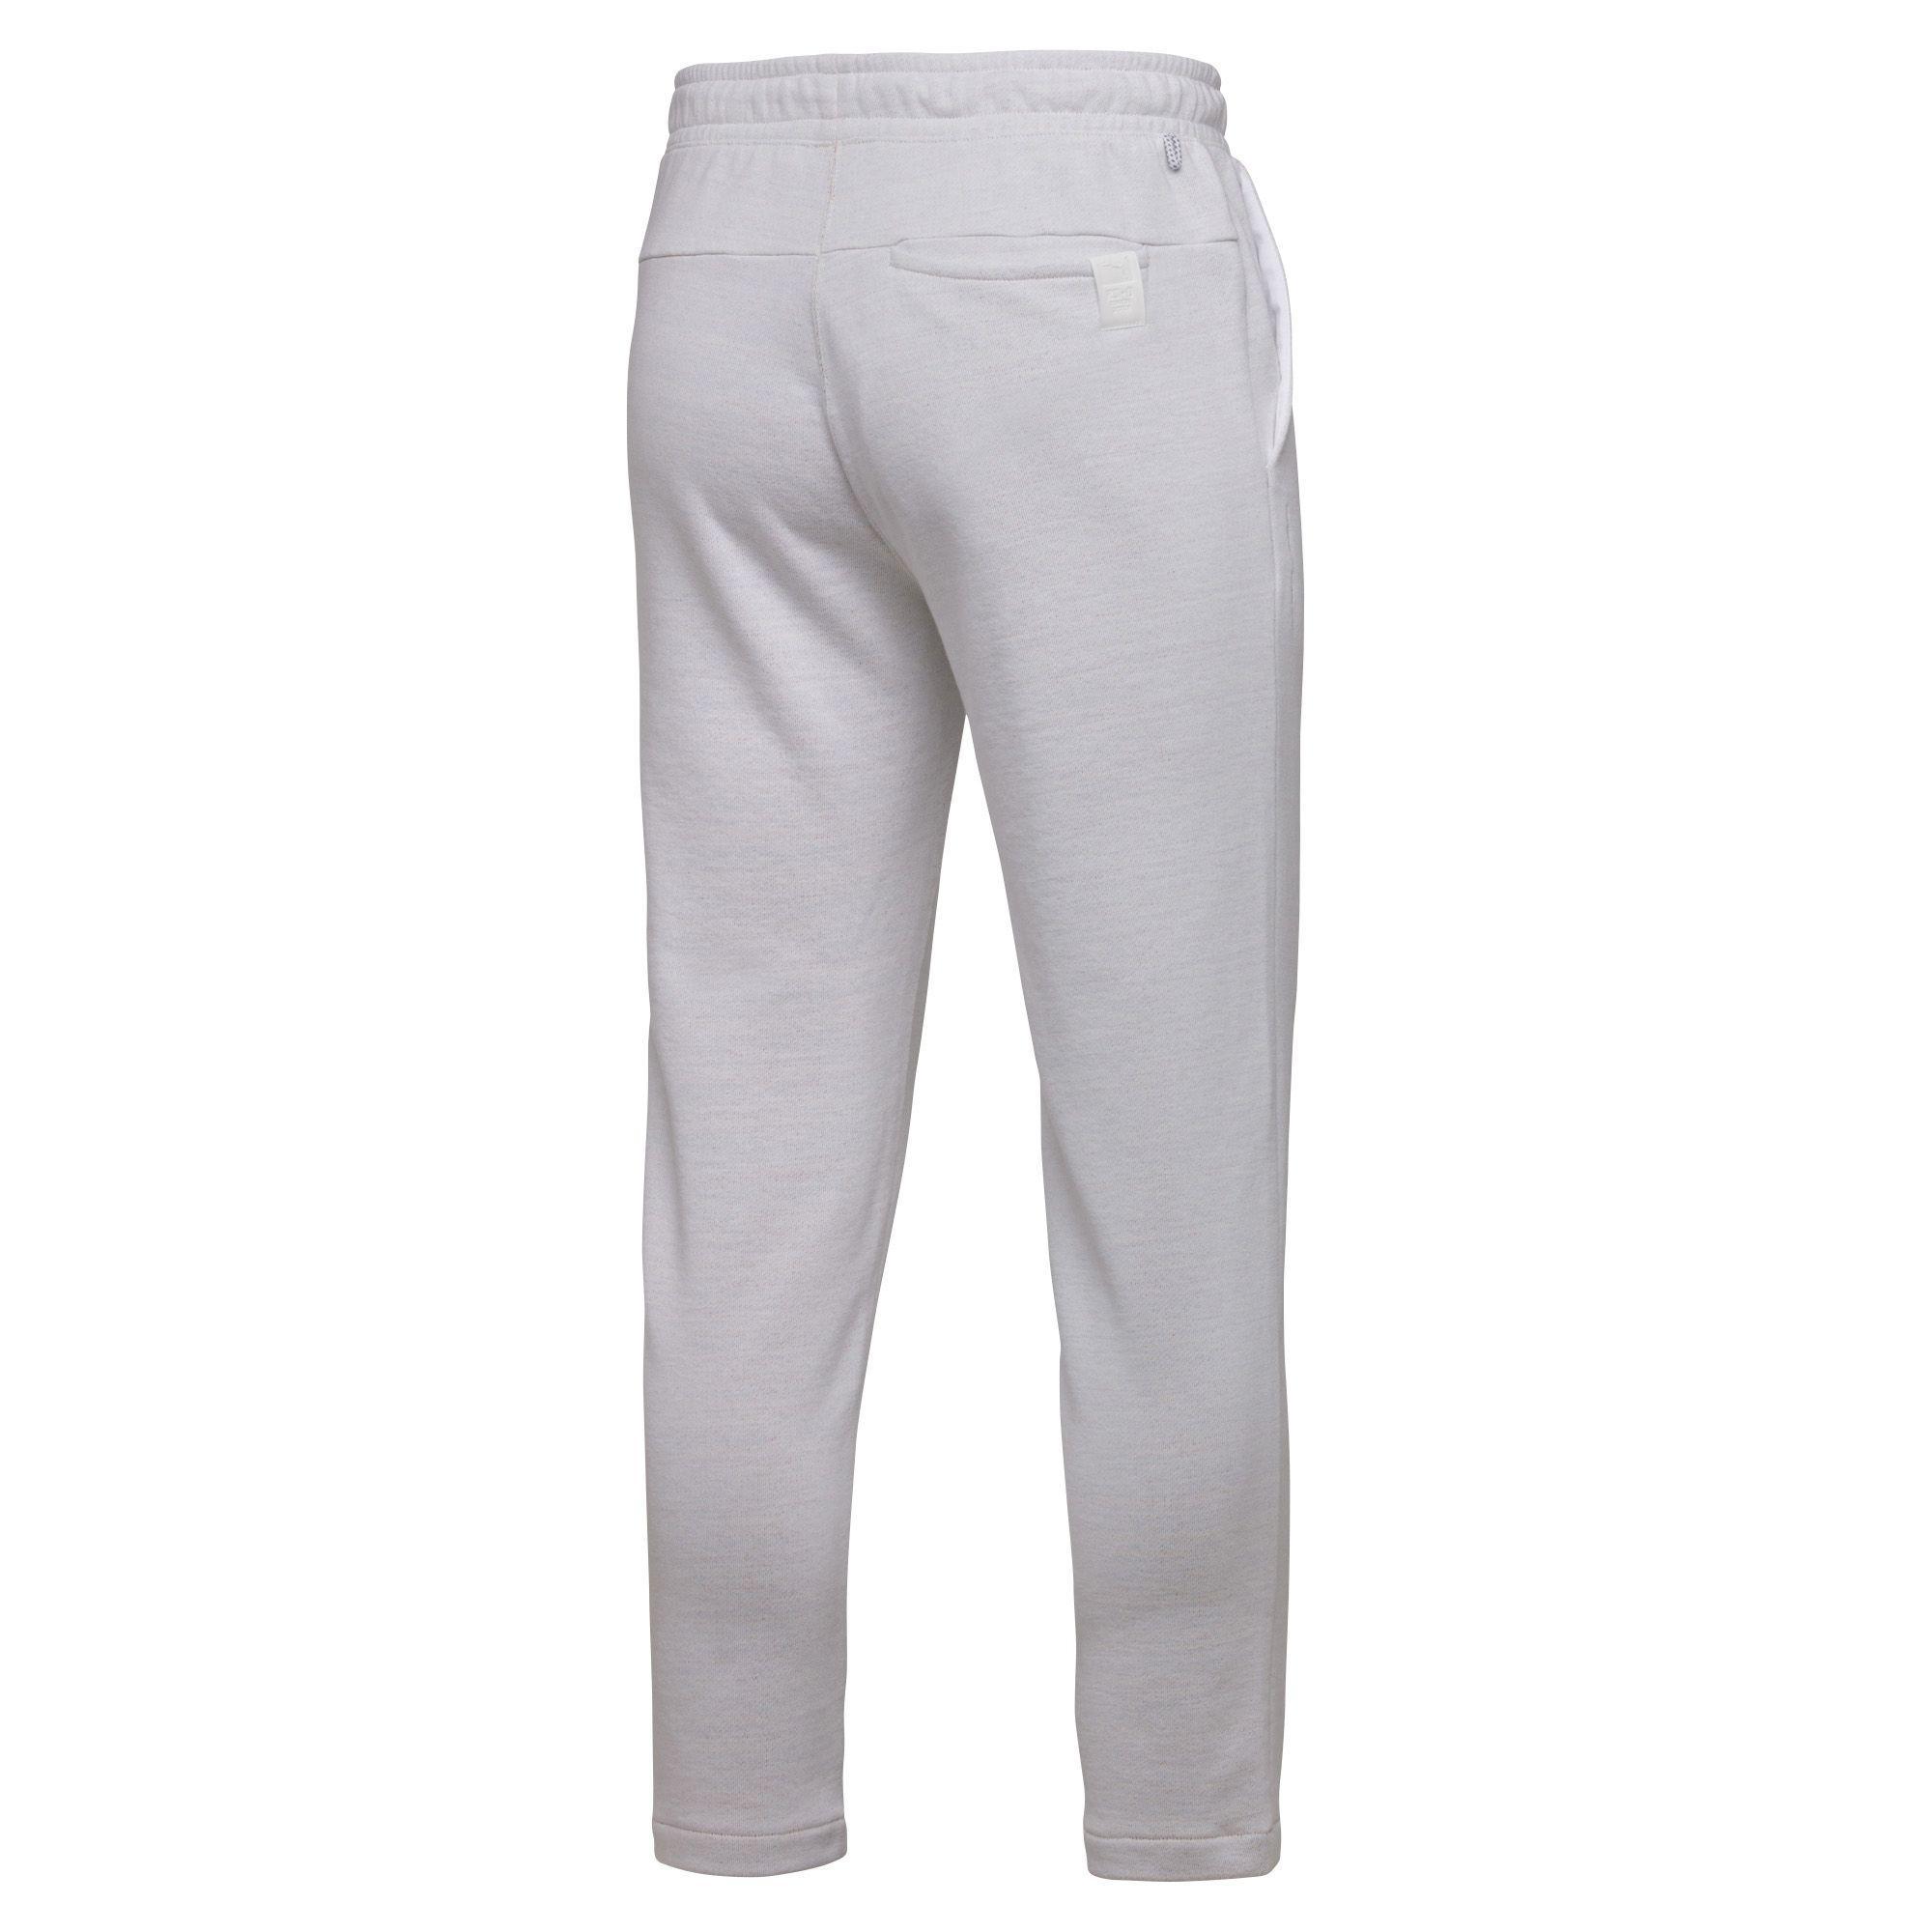 9ad3ffdaf47a Lyst - PUMA Rs-0 Capsule Men s Sweatpants in Gray for Men